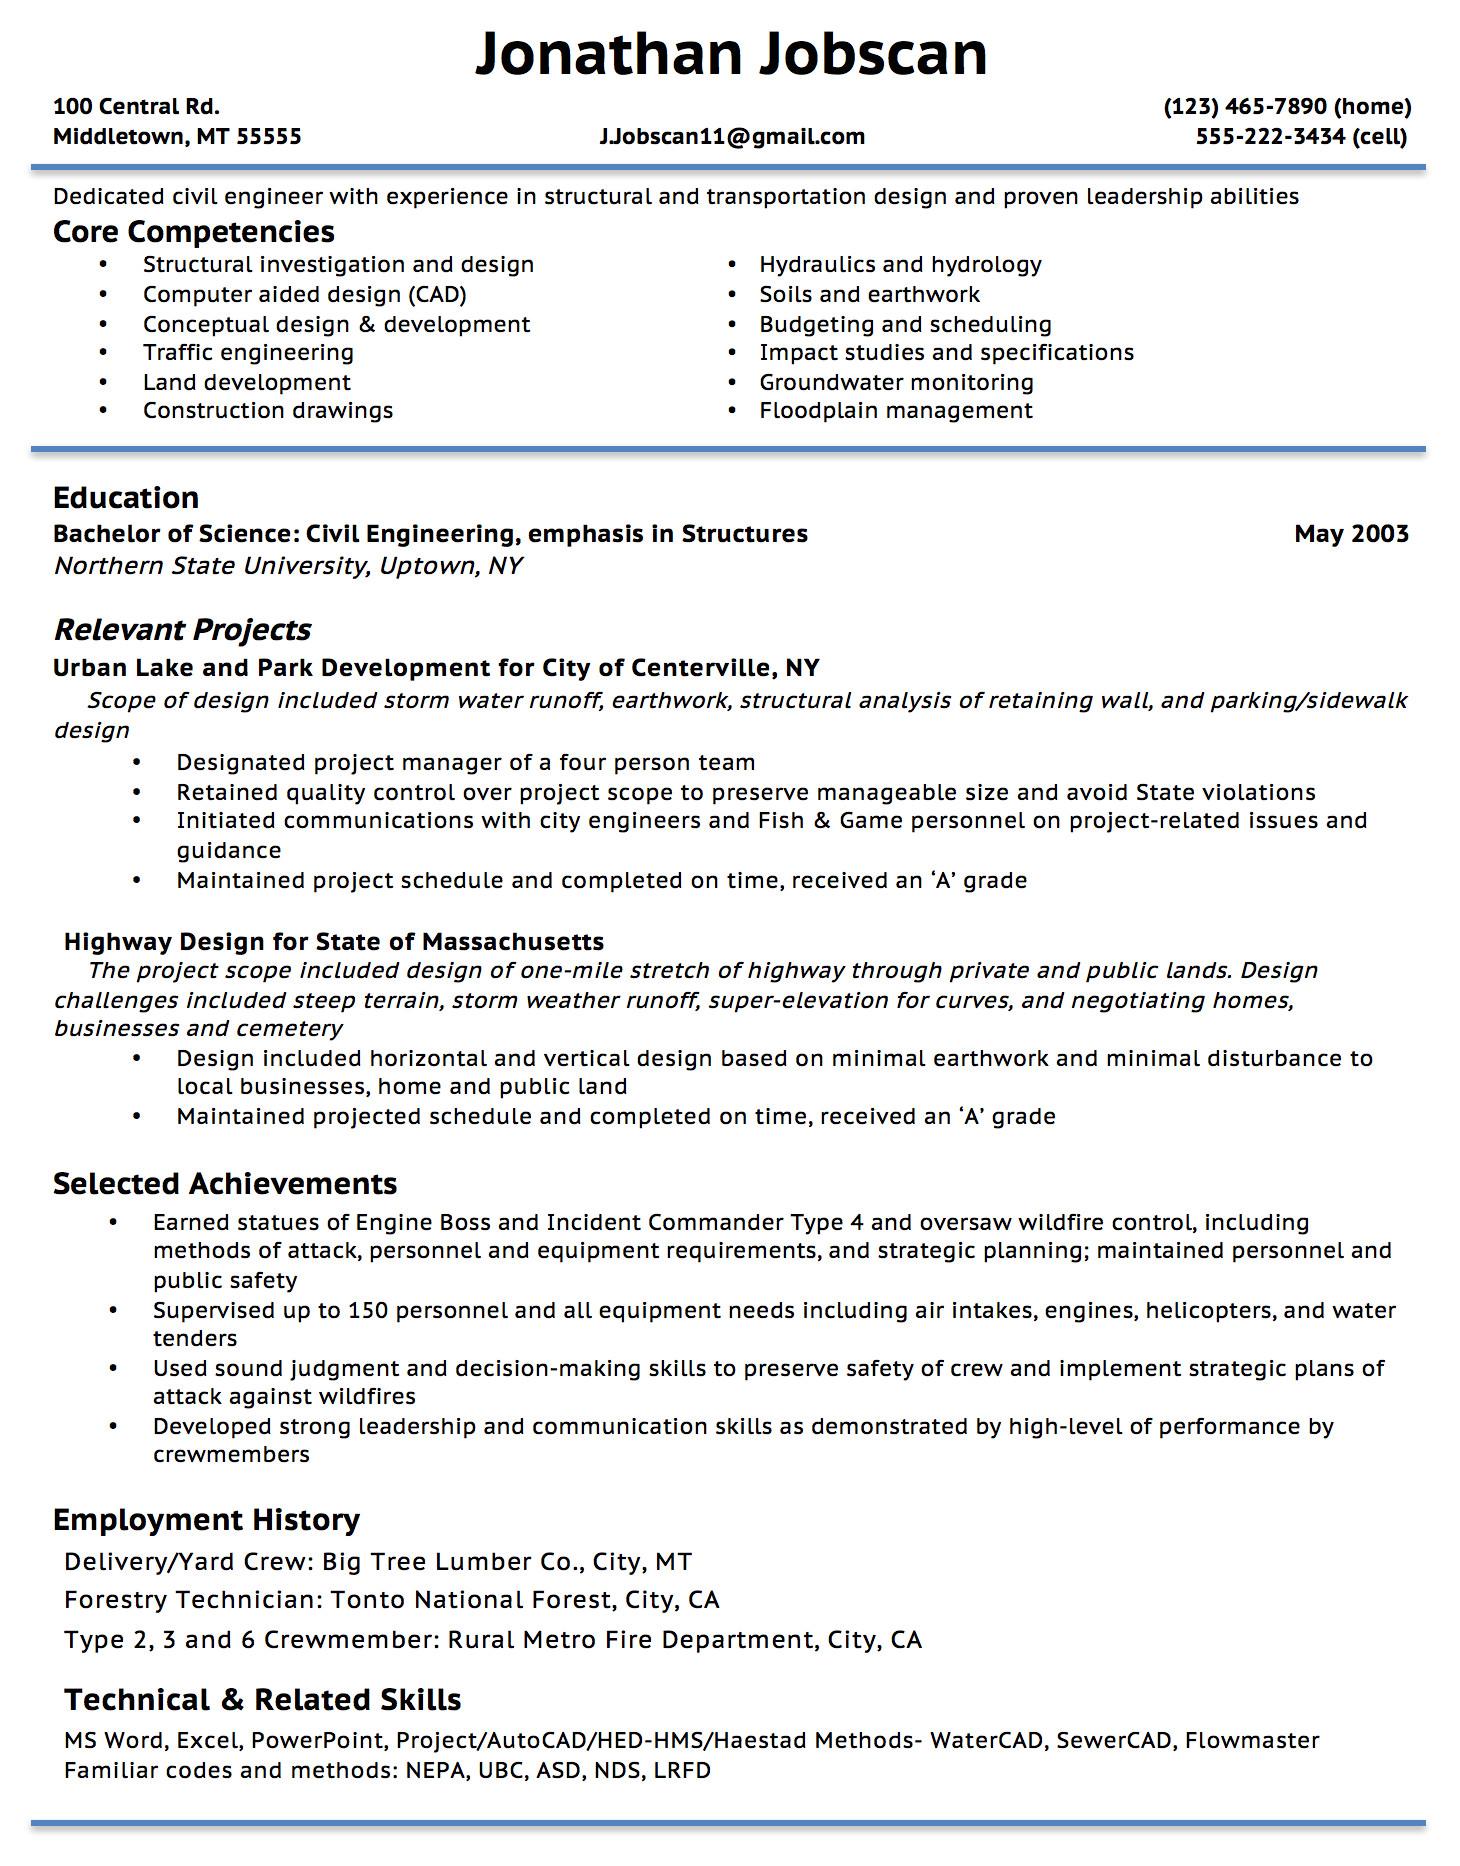 Competency Based Resume Sample Resume Key Competencies Examples Sidemcicek Com